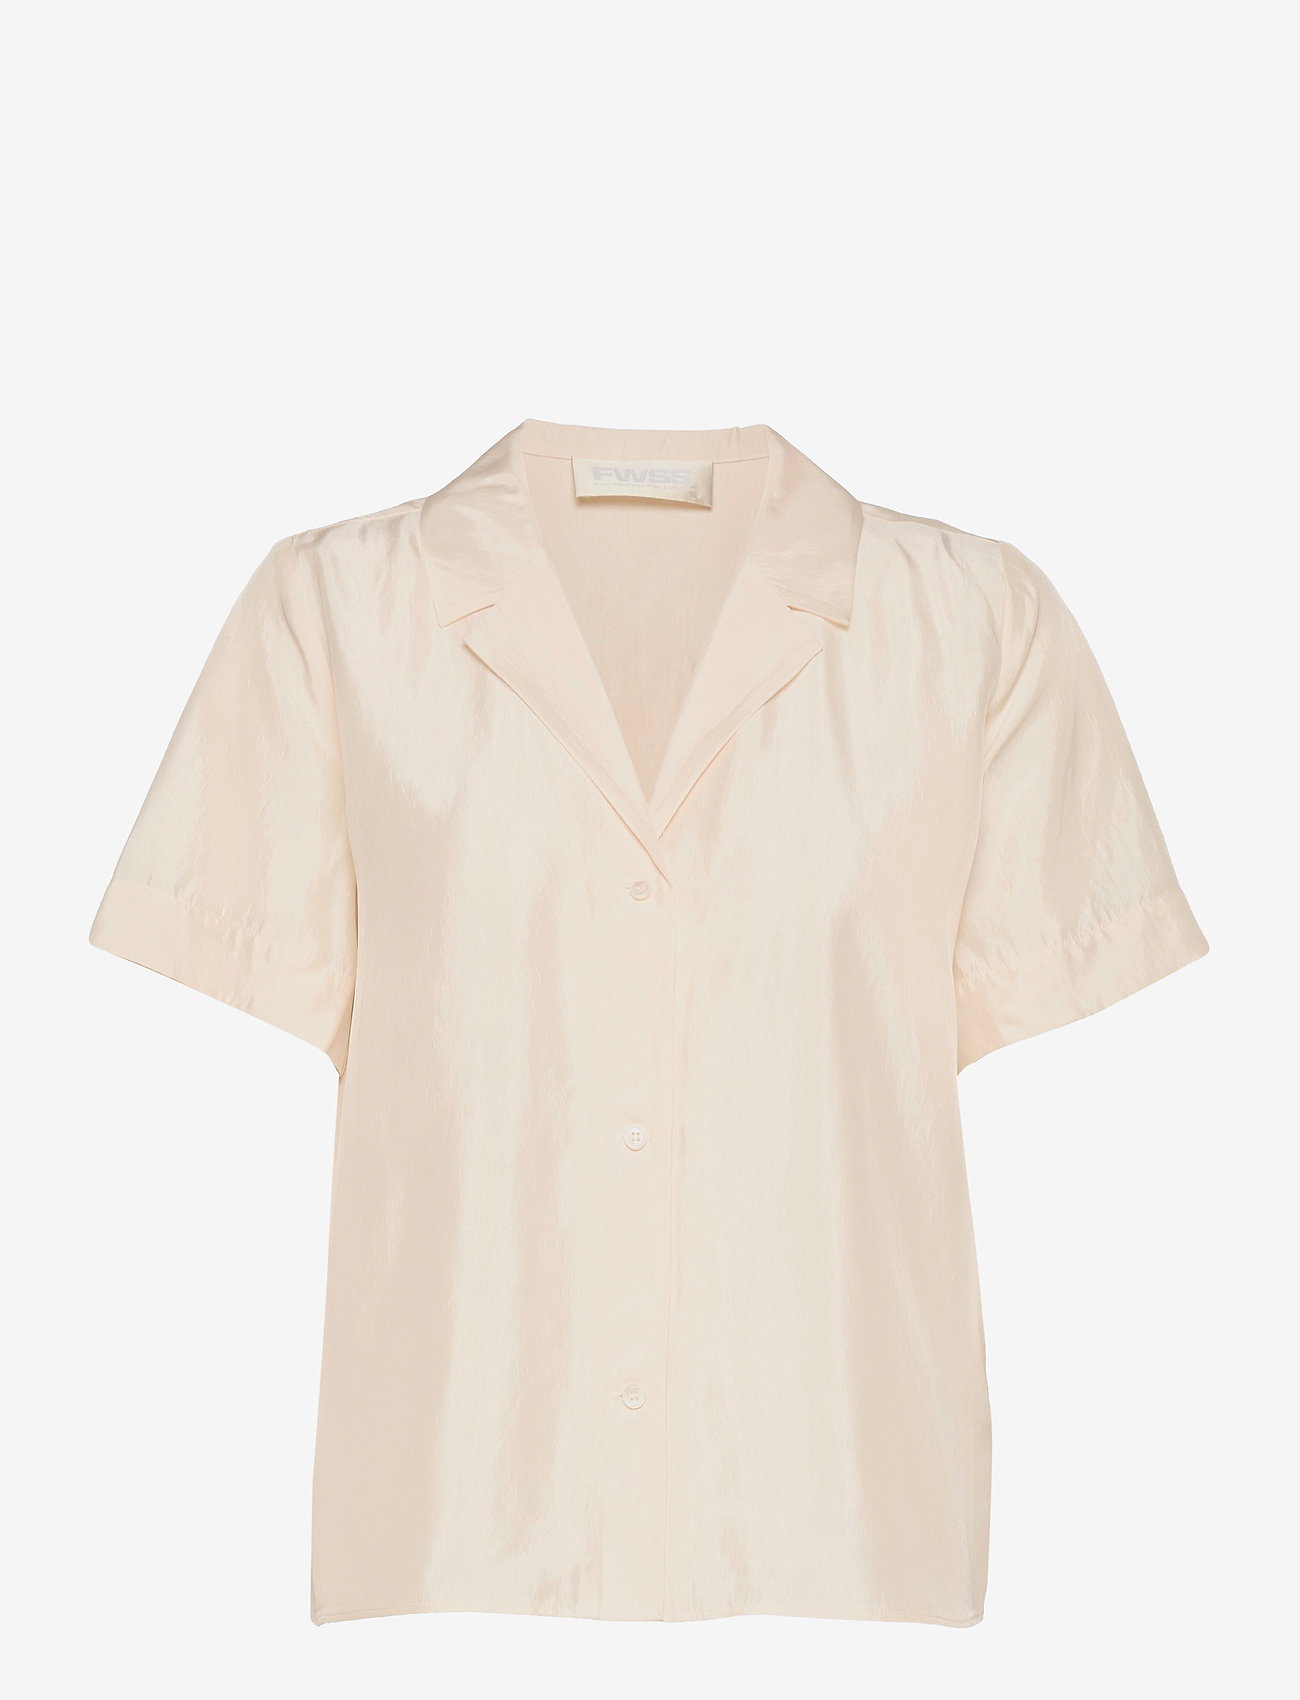 Fall Winter Spring Summer - Hong Kong Garden - kortärmade skjortor - jet stream white - 0